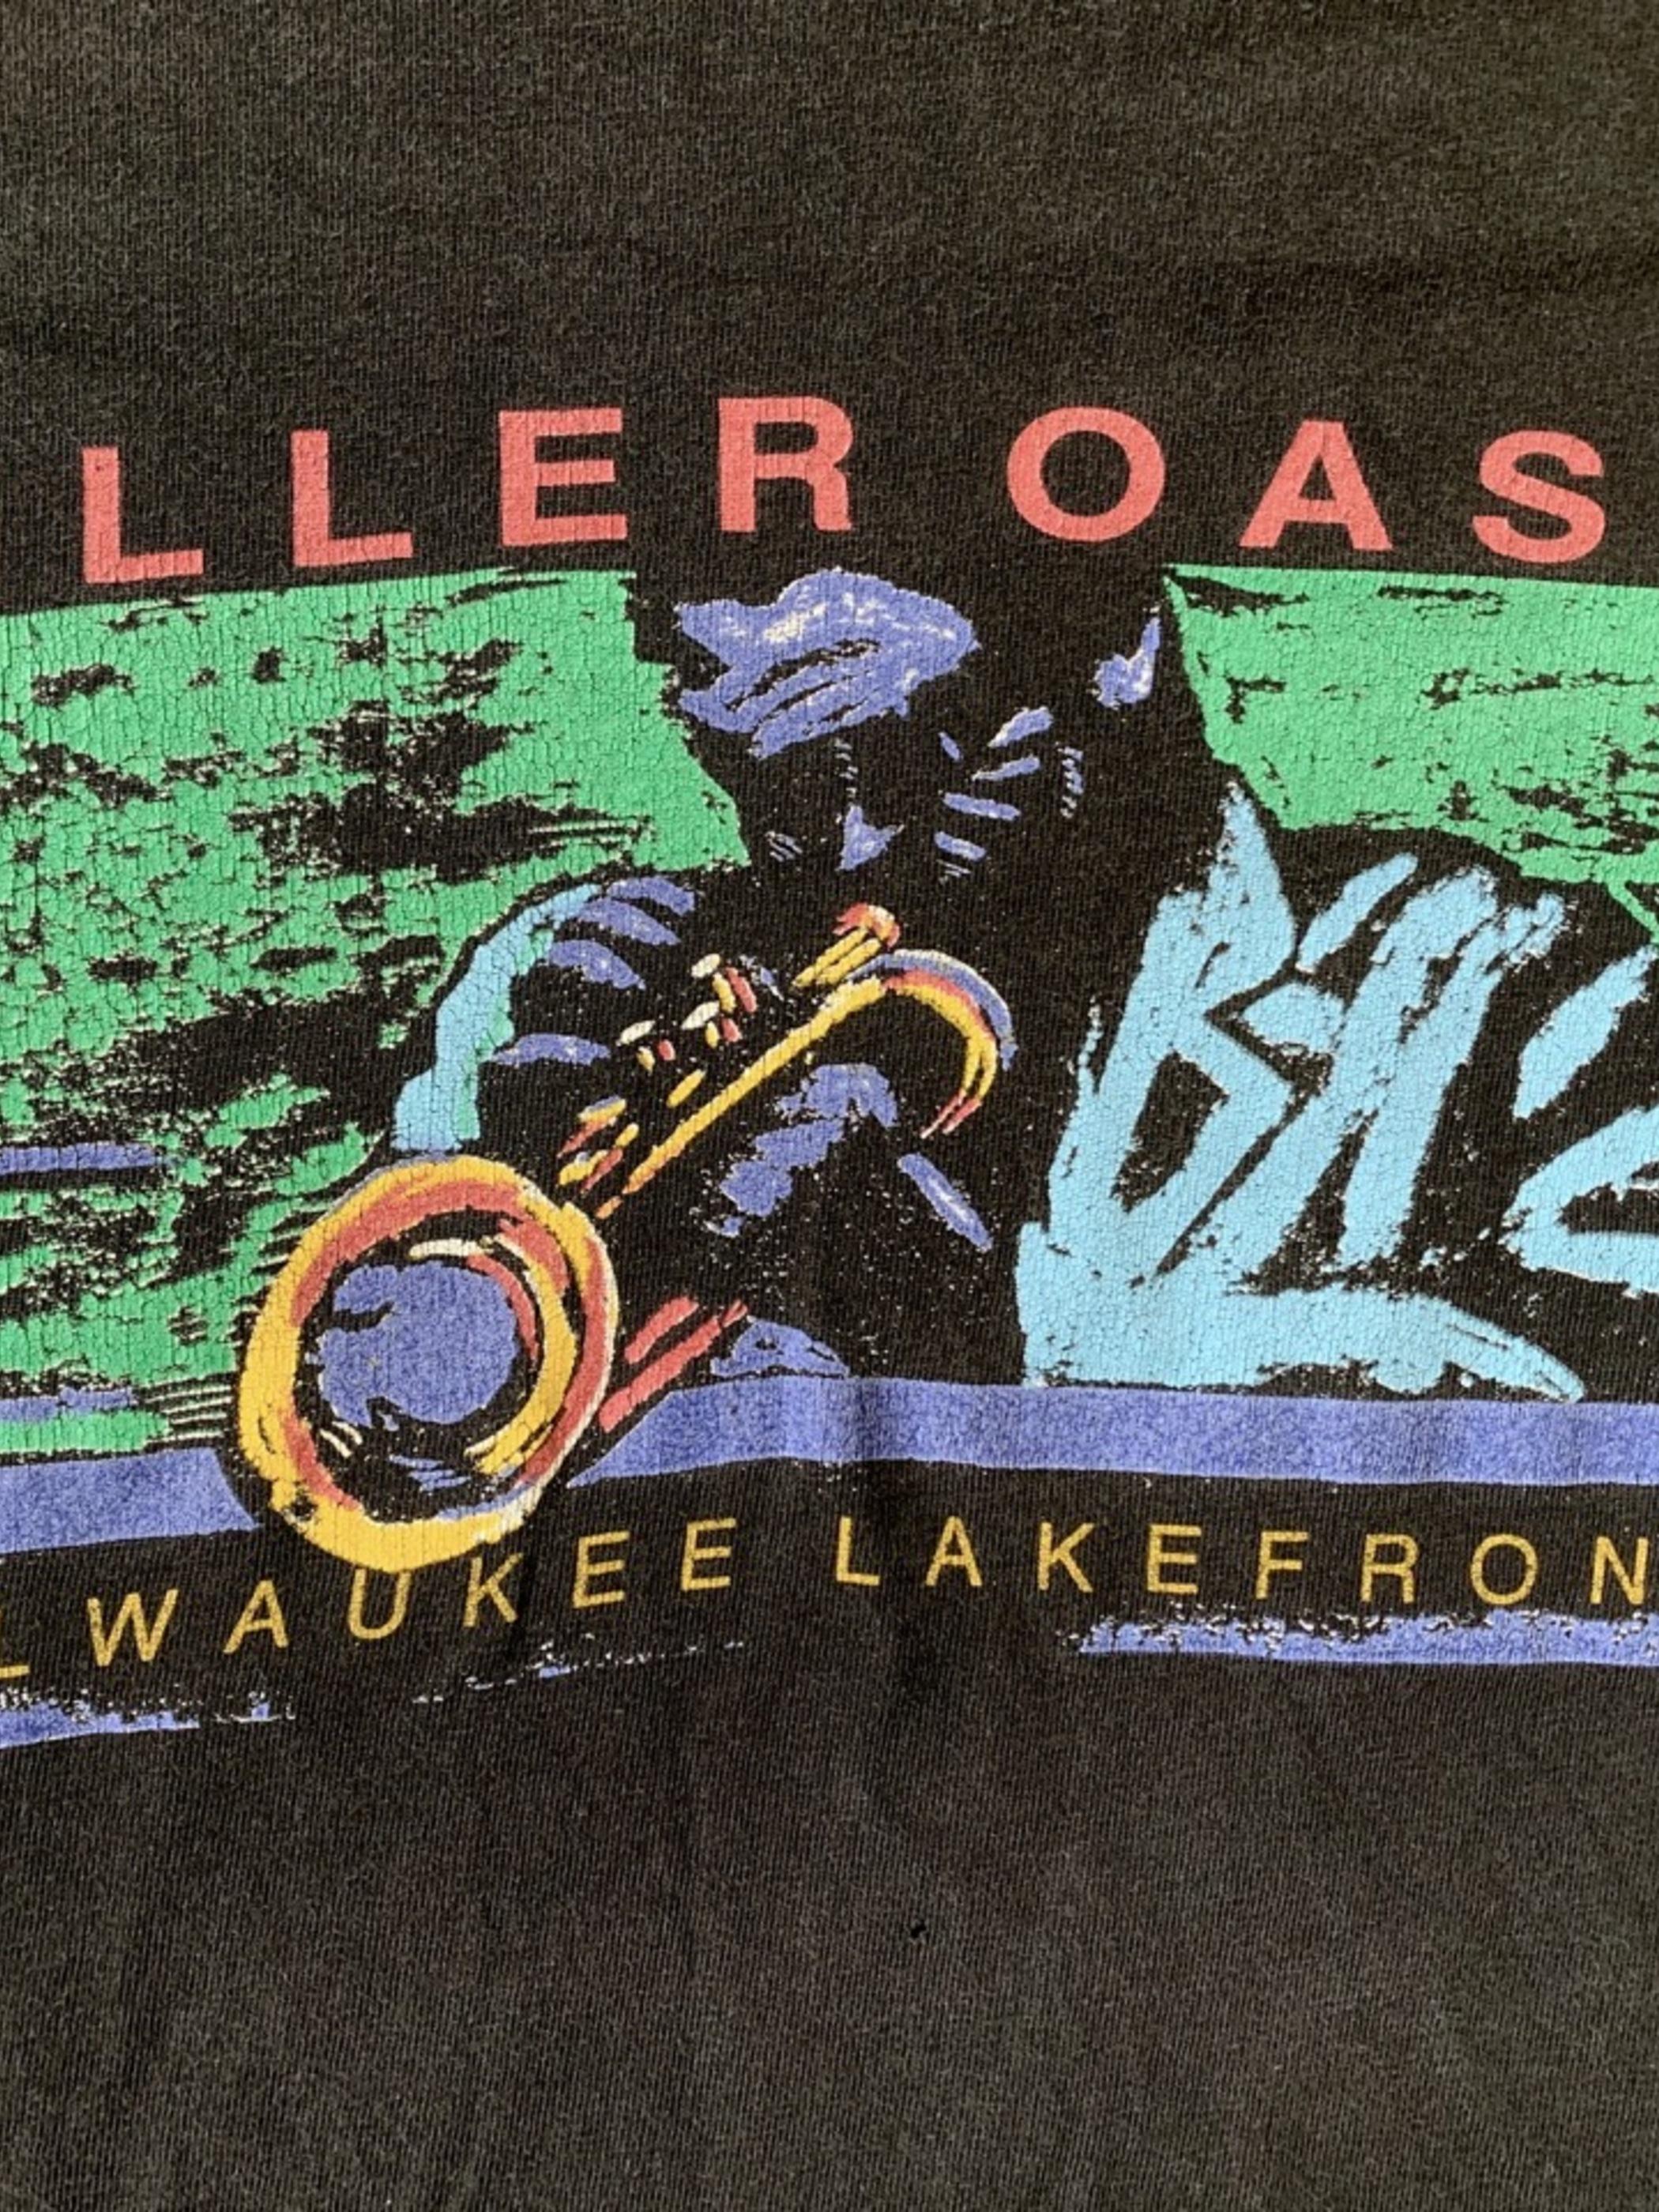 Vintage Miller Oasis jazz festival print t-shirt made in USA